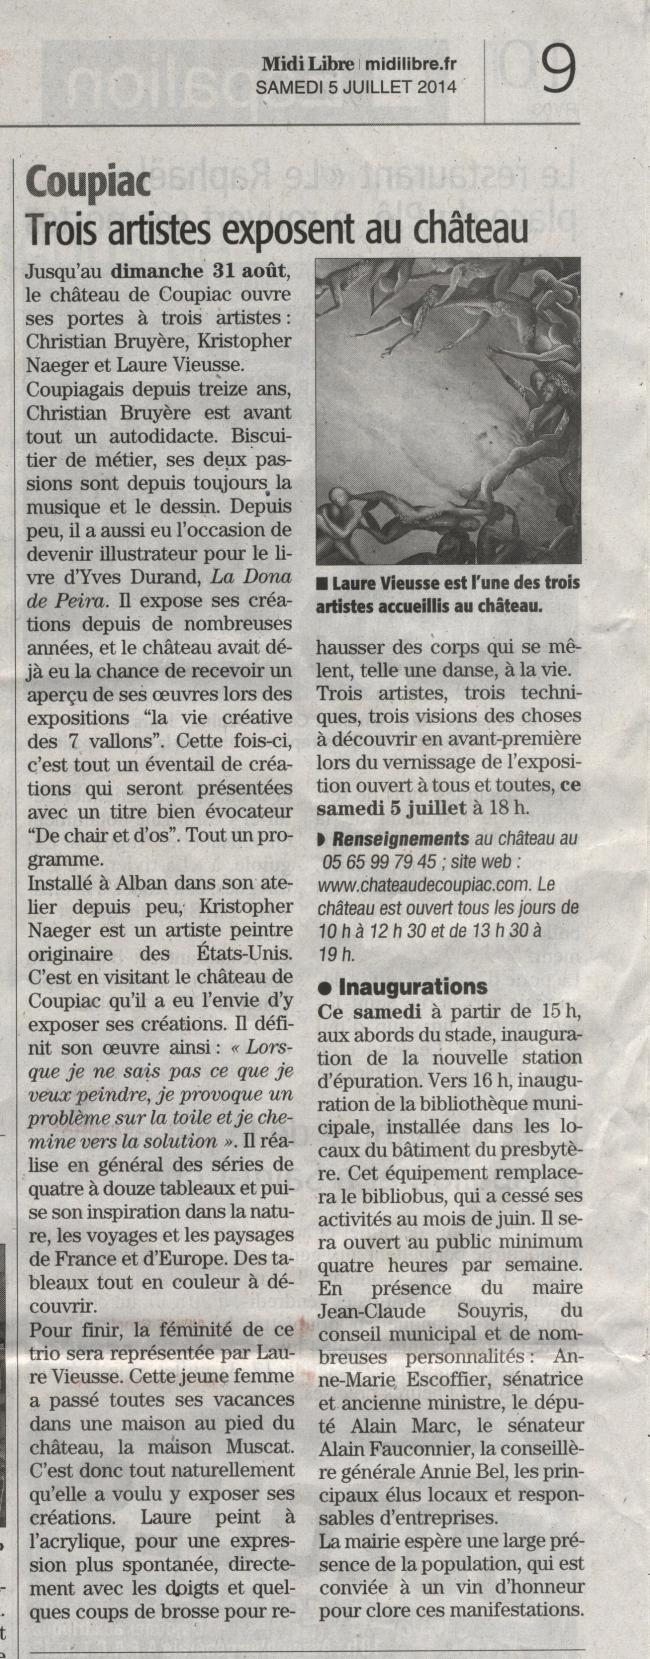 midi libre  coupiac 5 juillet 2014.jpg